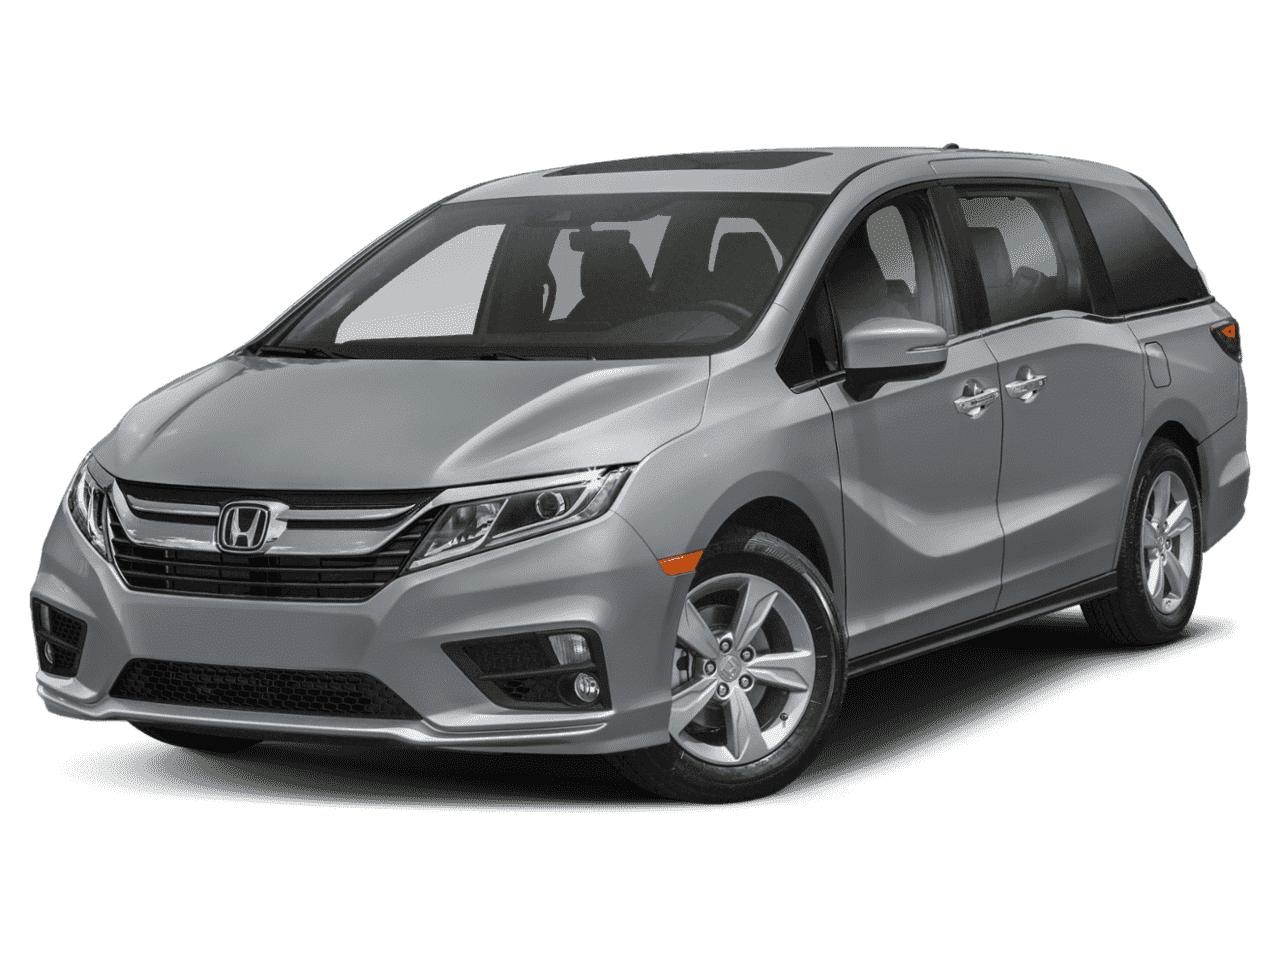 Minivan-Rental-Vancouver-Car-Rental-Honda-Odyssey